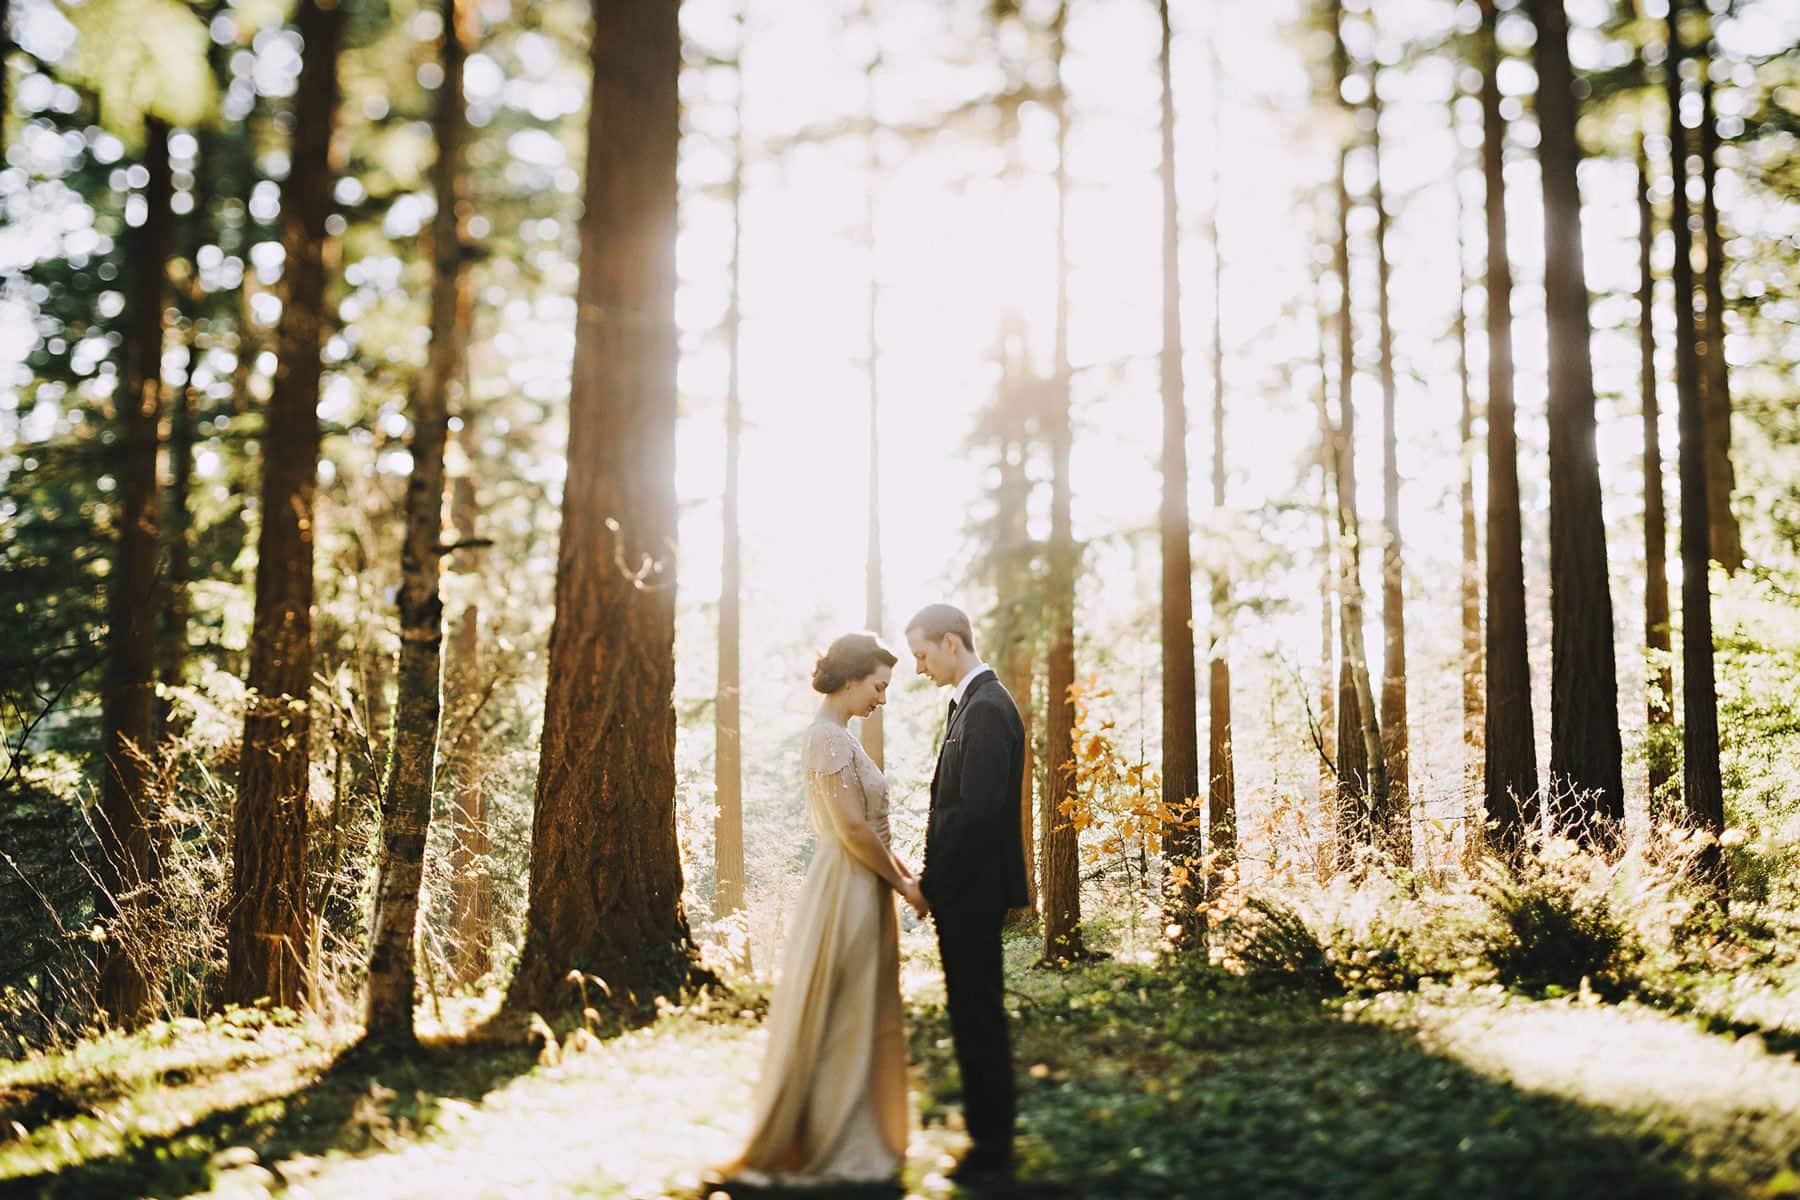 portland elopement photo